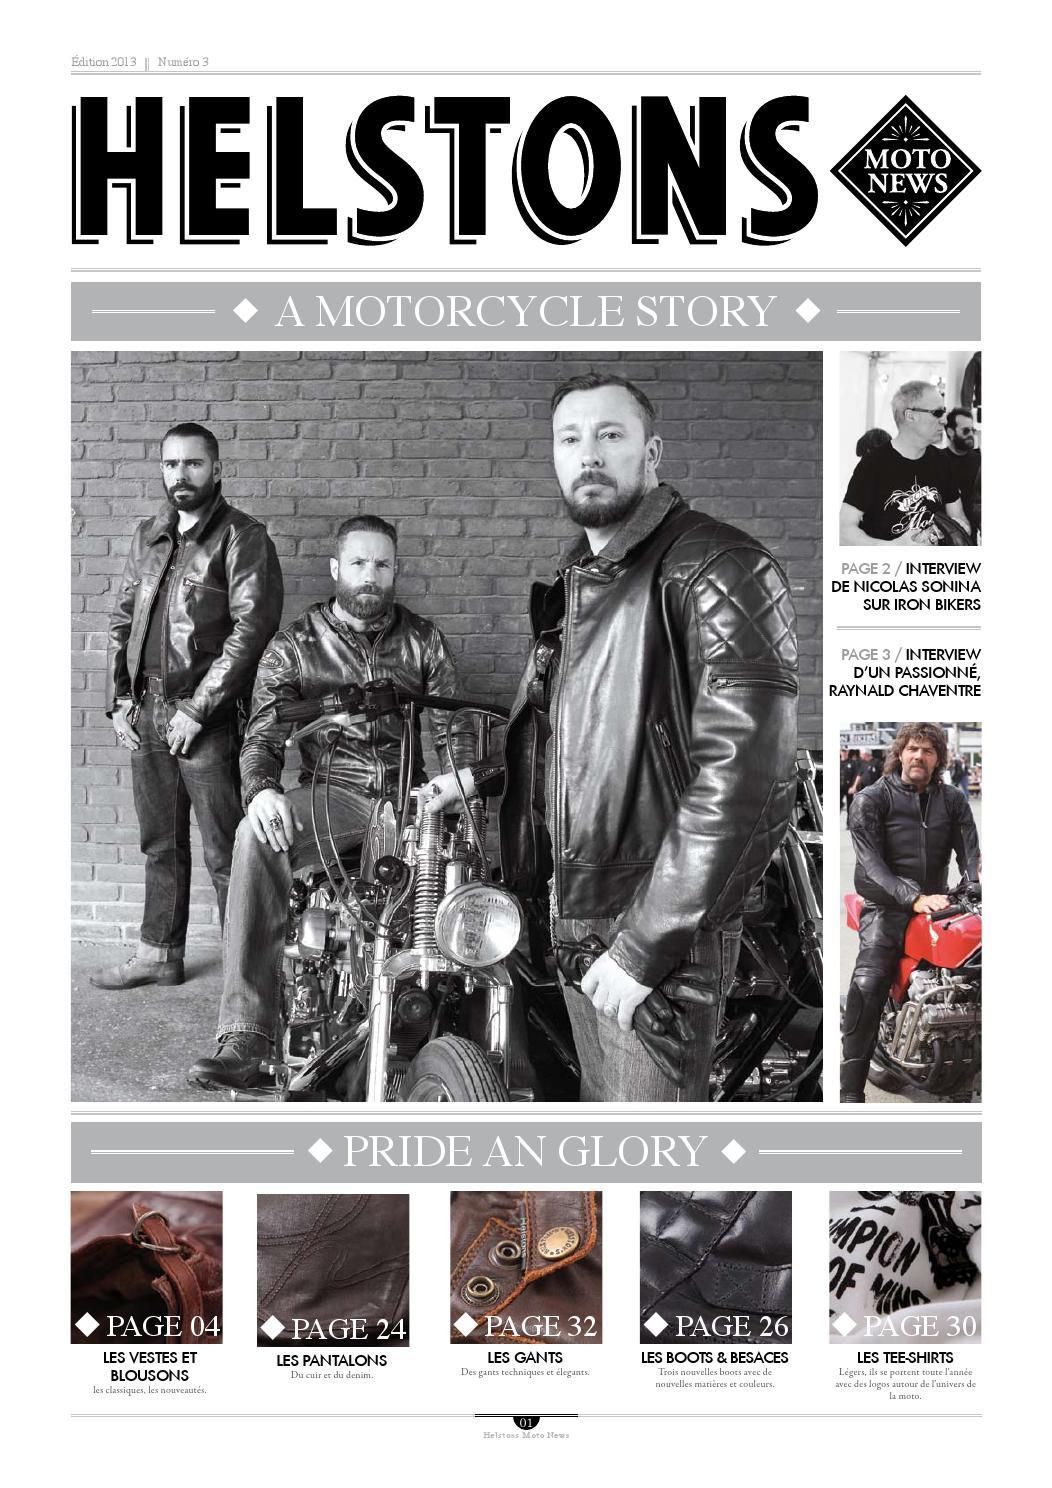 Bottes Moto Helstons Heritage Cuir Aniline Noir 45 Noir